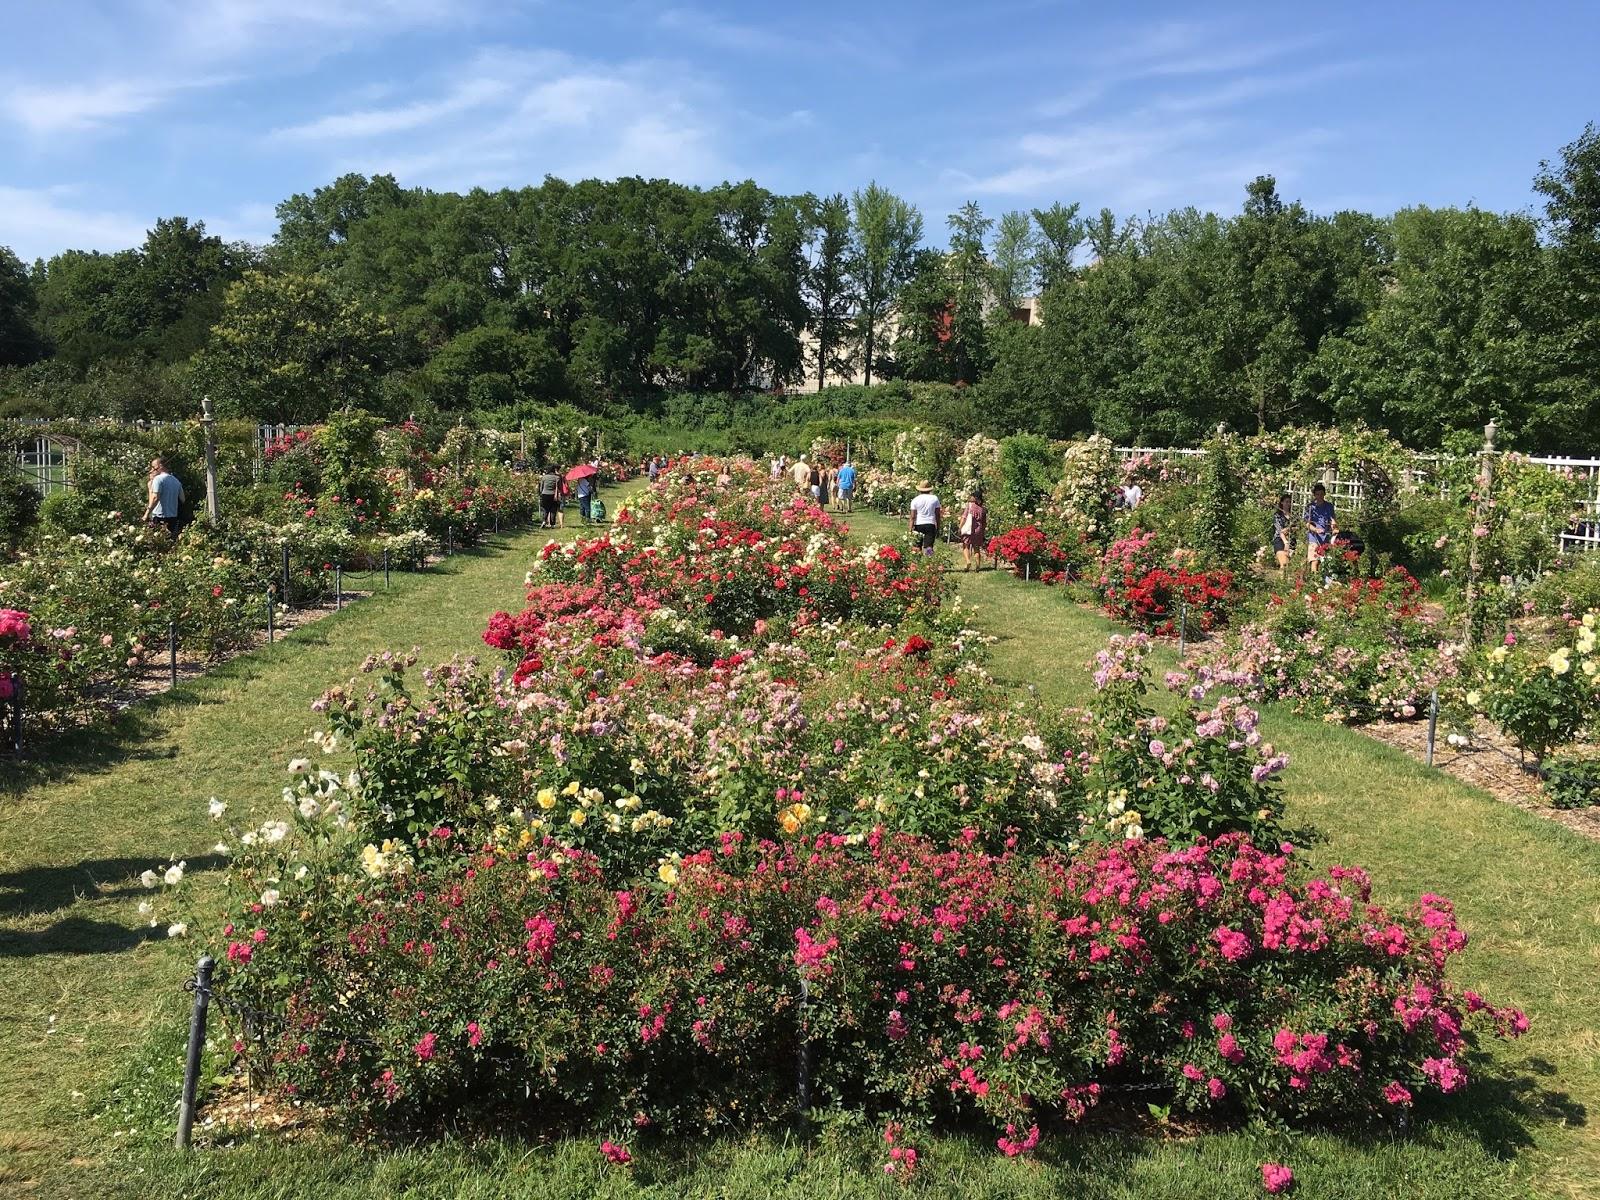 Bart Boehlert\'s Beautiful Things: A Visit to the Brooklyn Botanic Garden